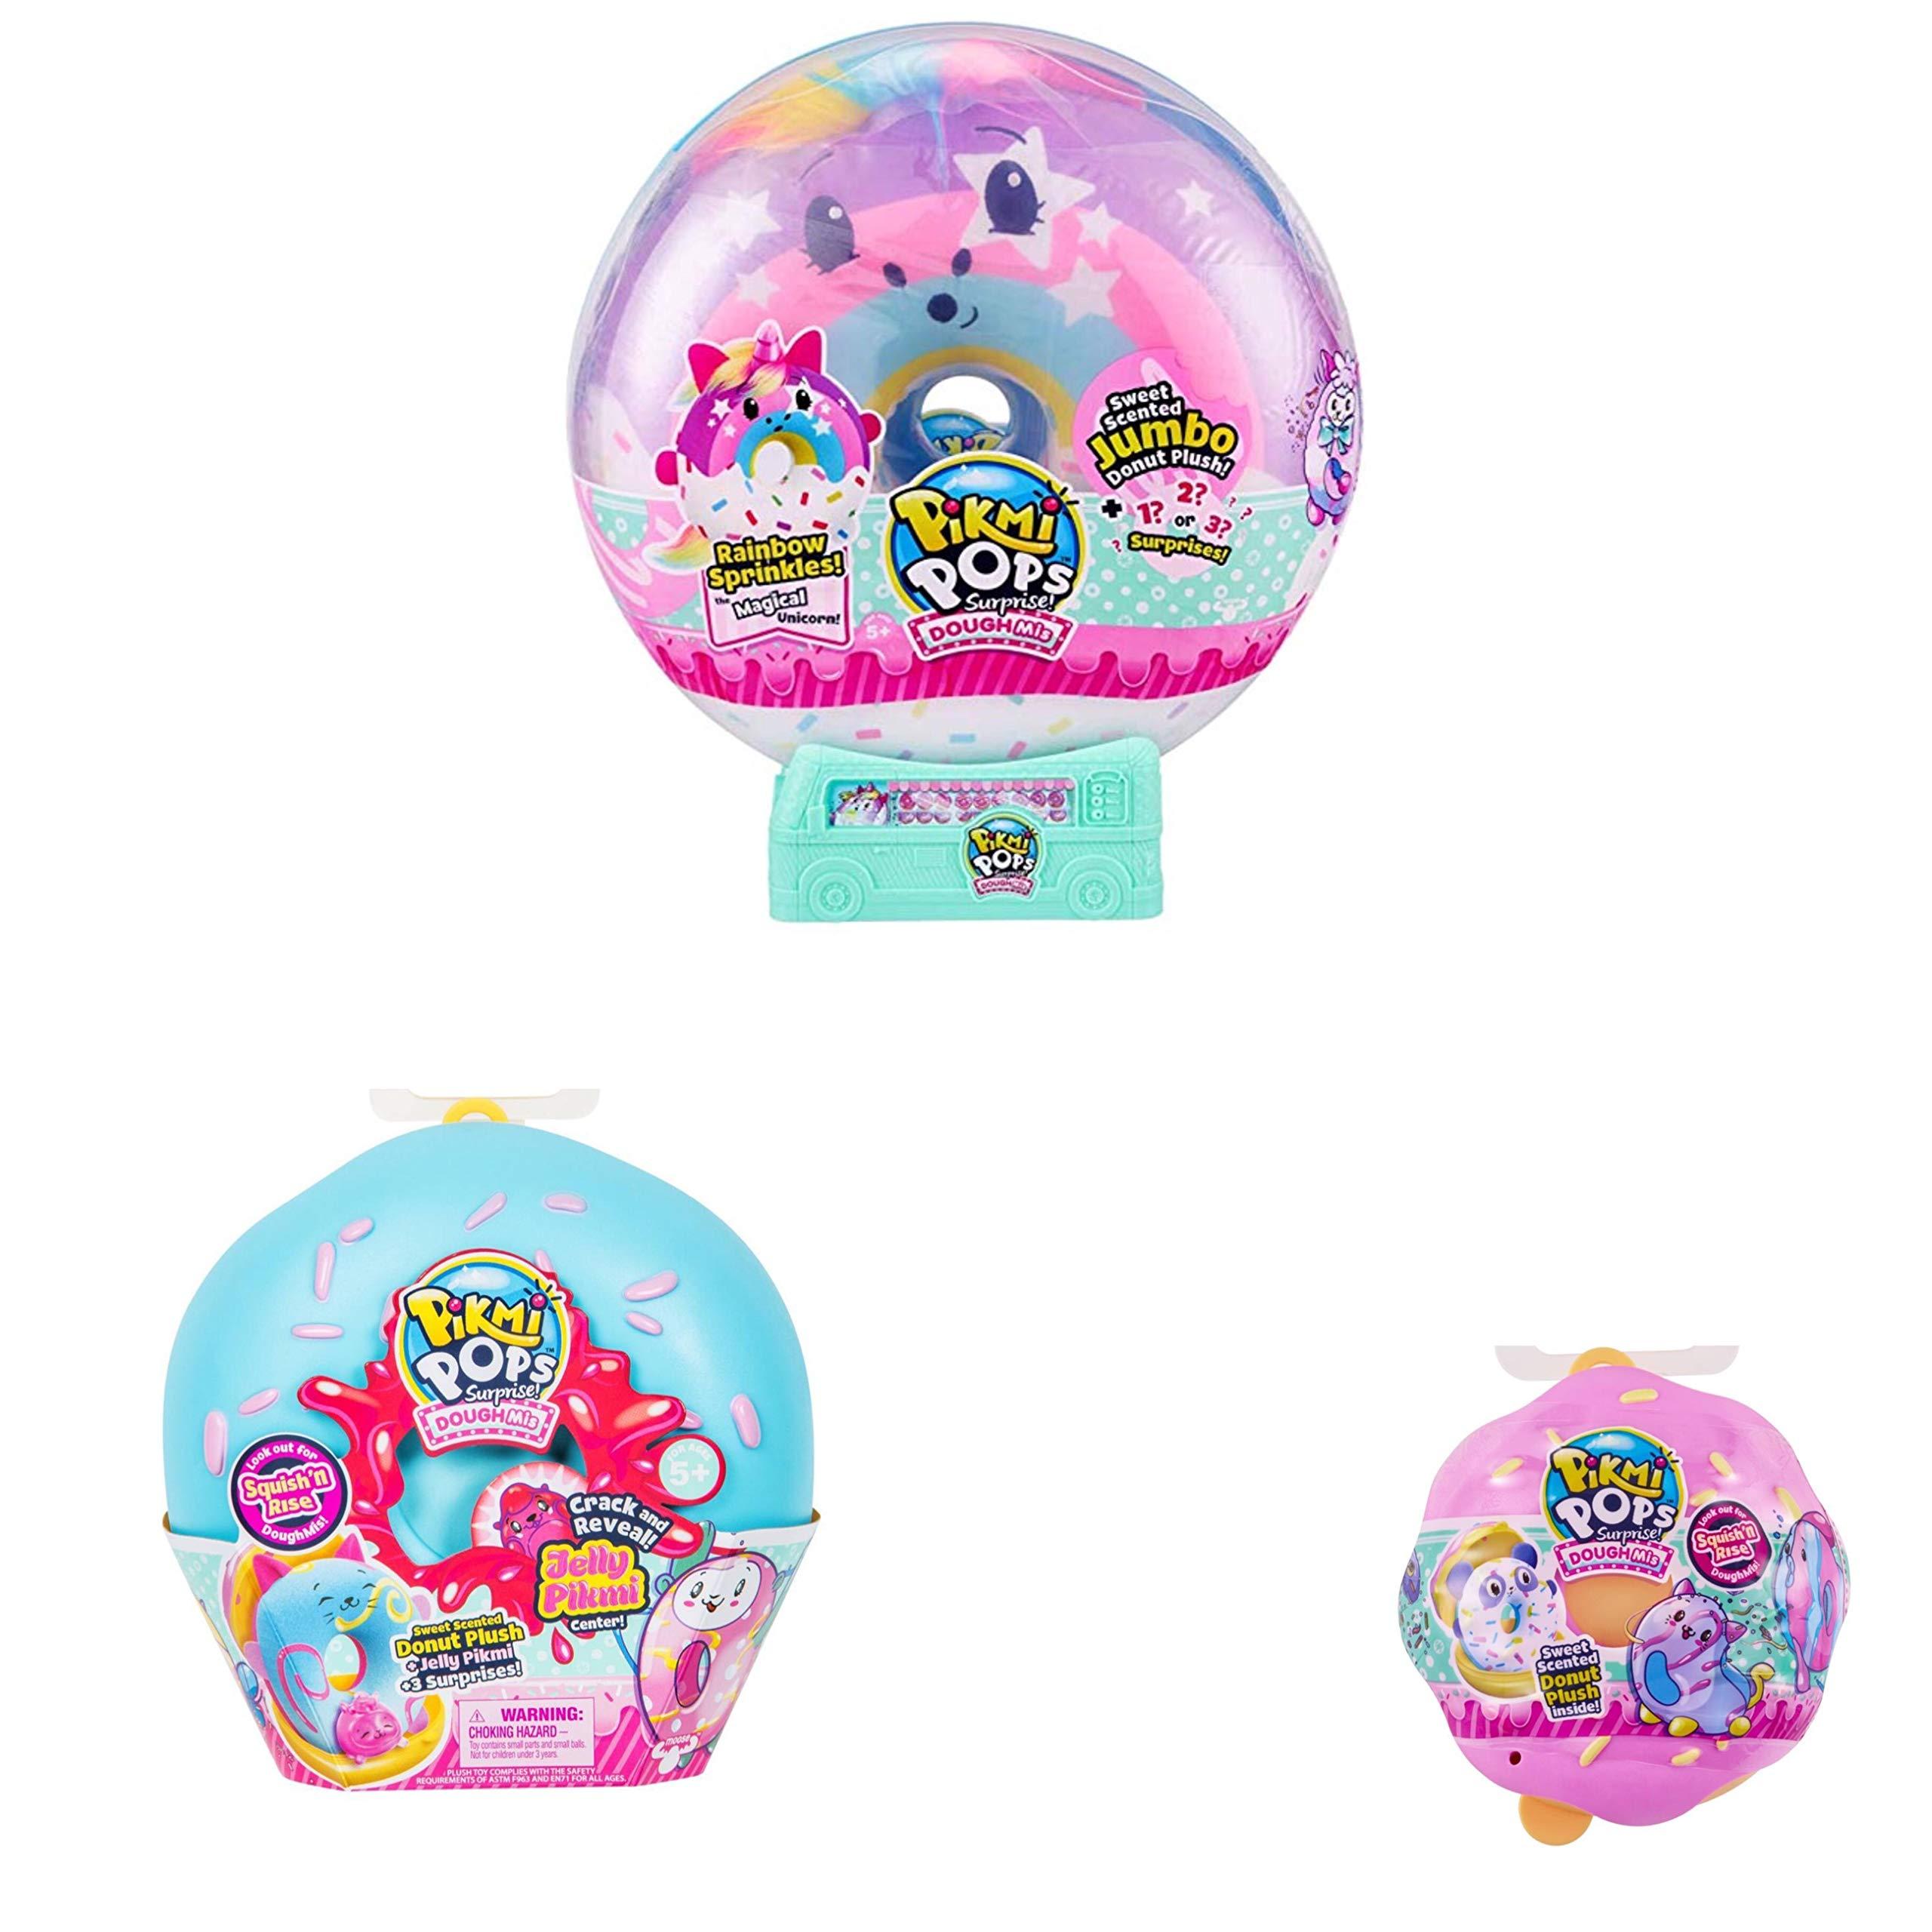 Pikmi Pops Doughmis Series Large Pack 10'' - Rainbow Sprinkles The Unicorn, Medium and Single Doughmi Surprise Bundle